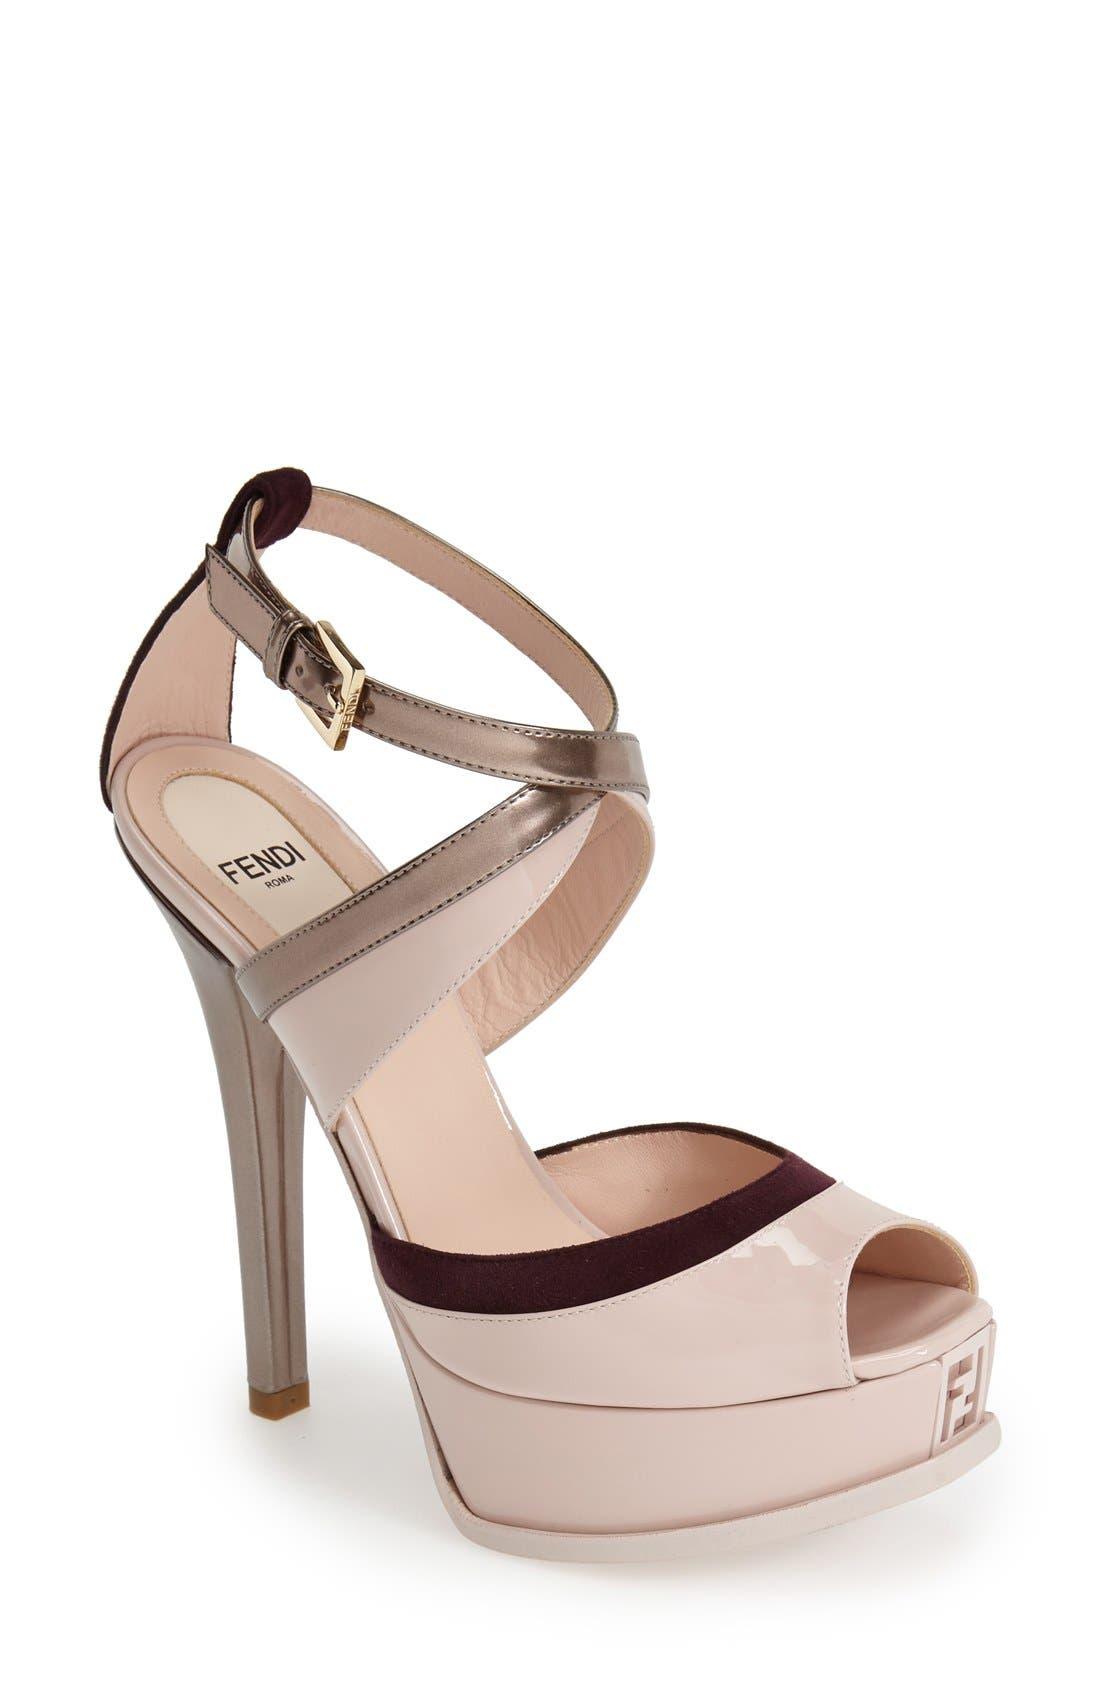 Alternate Image 1 Selected - Fendi 'Fendista' Platform Sandal (Women)